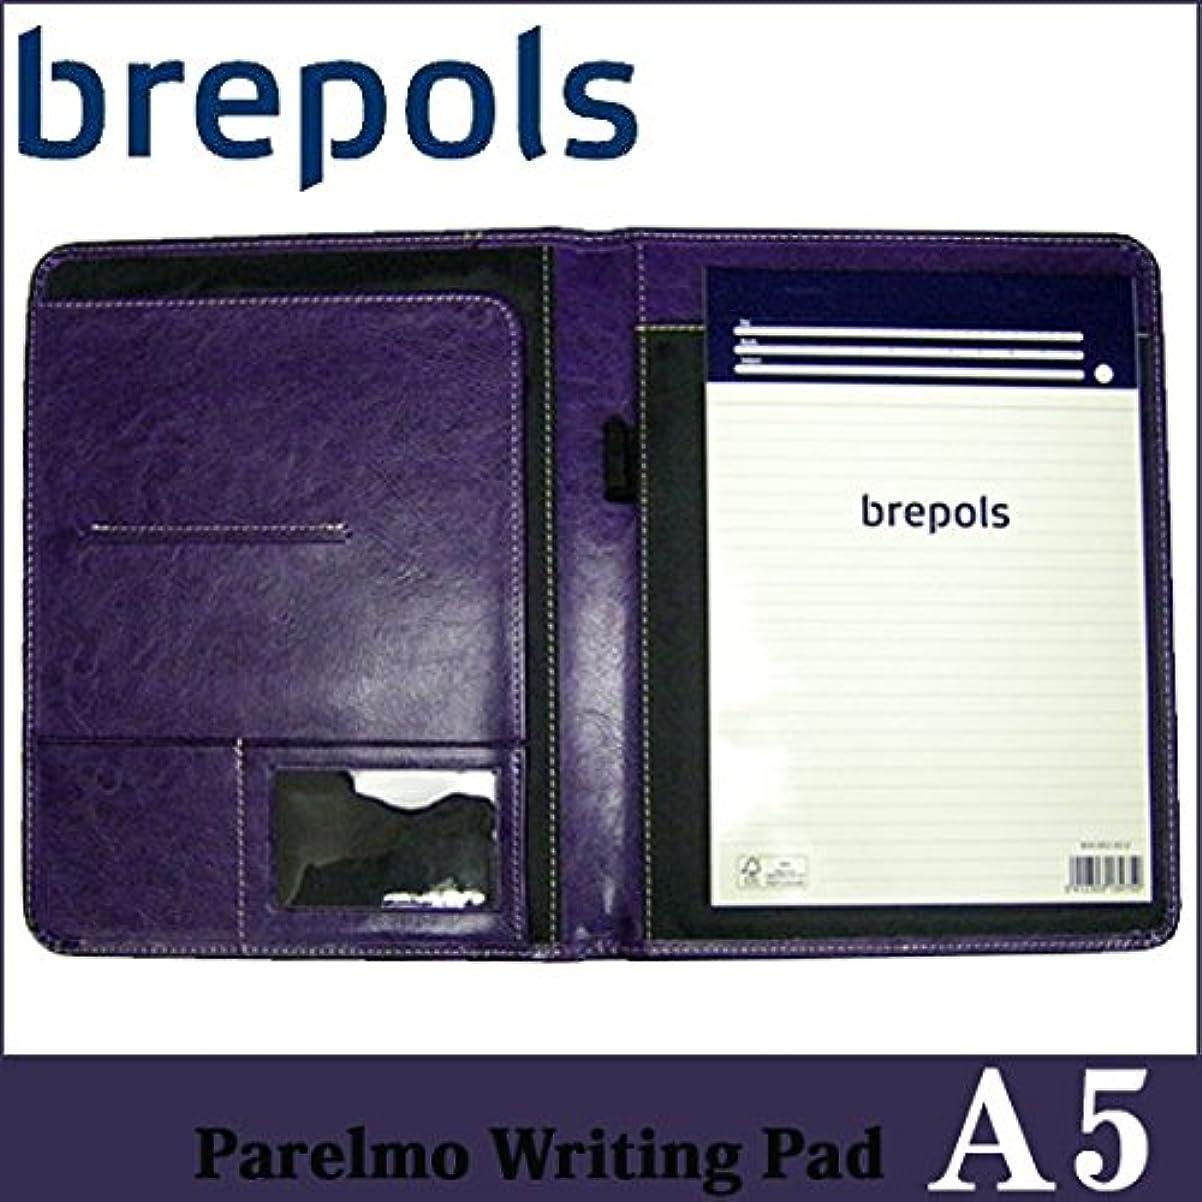 BREPOLS ブレポルス パレルモ ライティングパッド A5 パープル レポートパッドホルダー レポートカバー